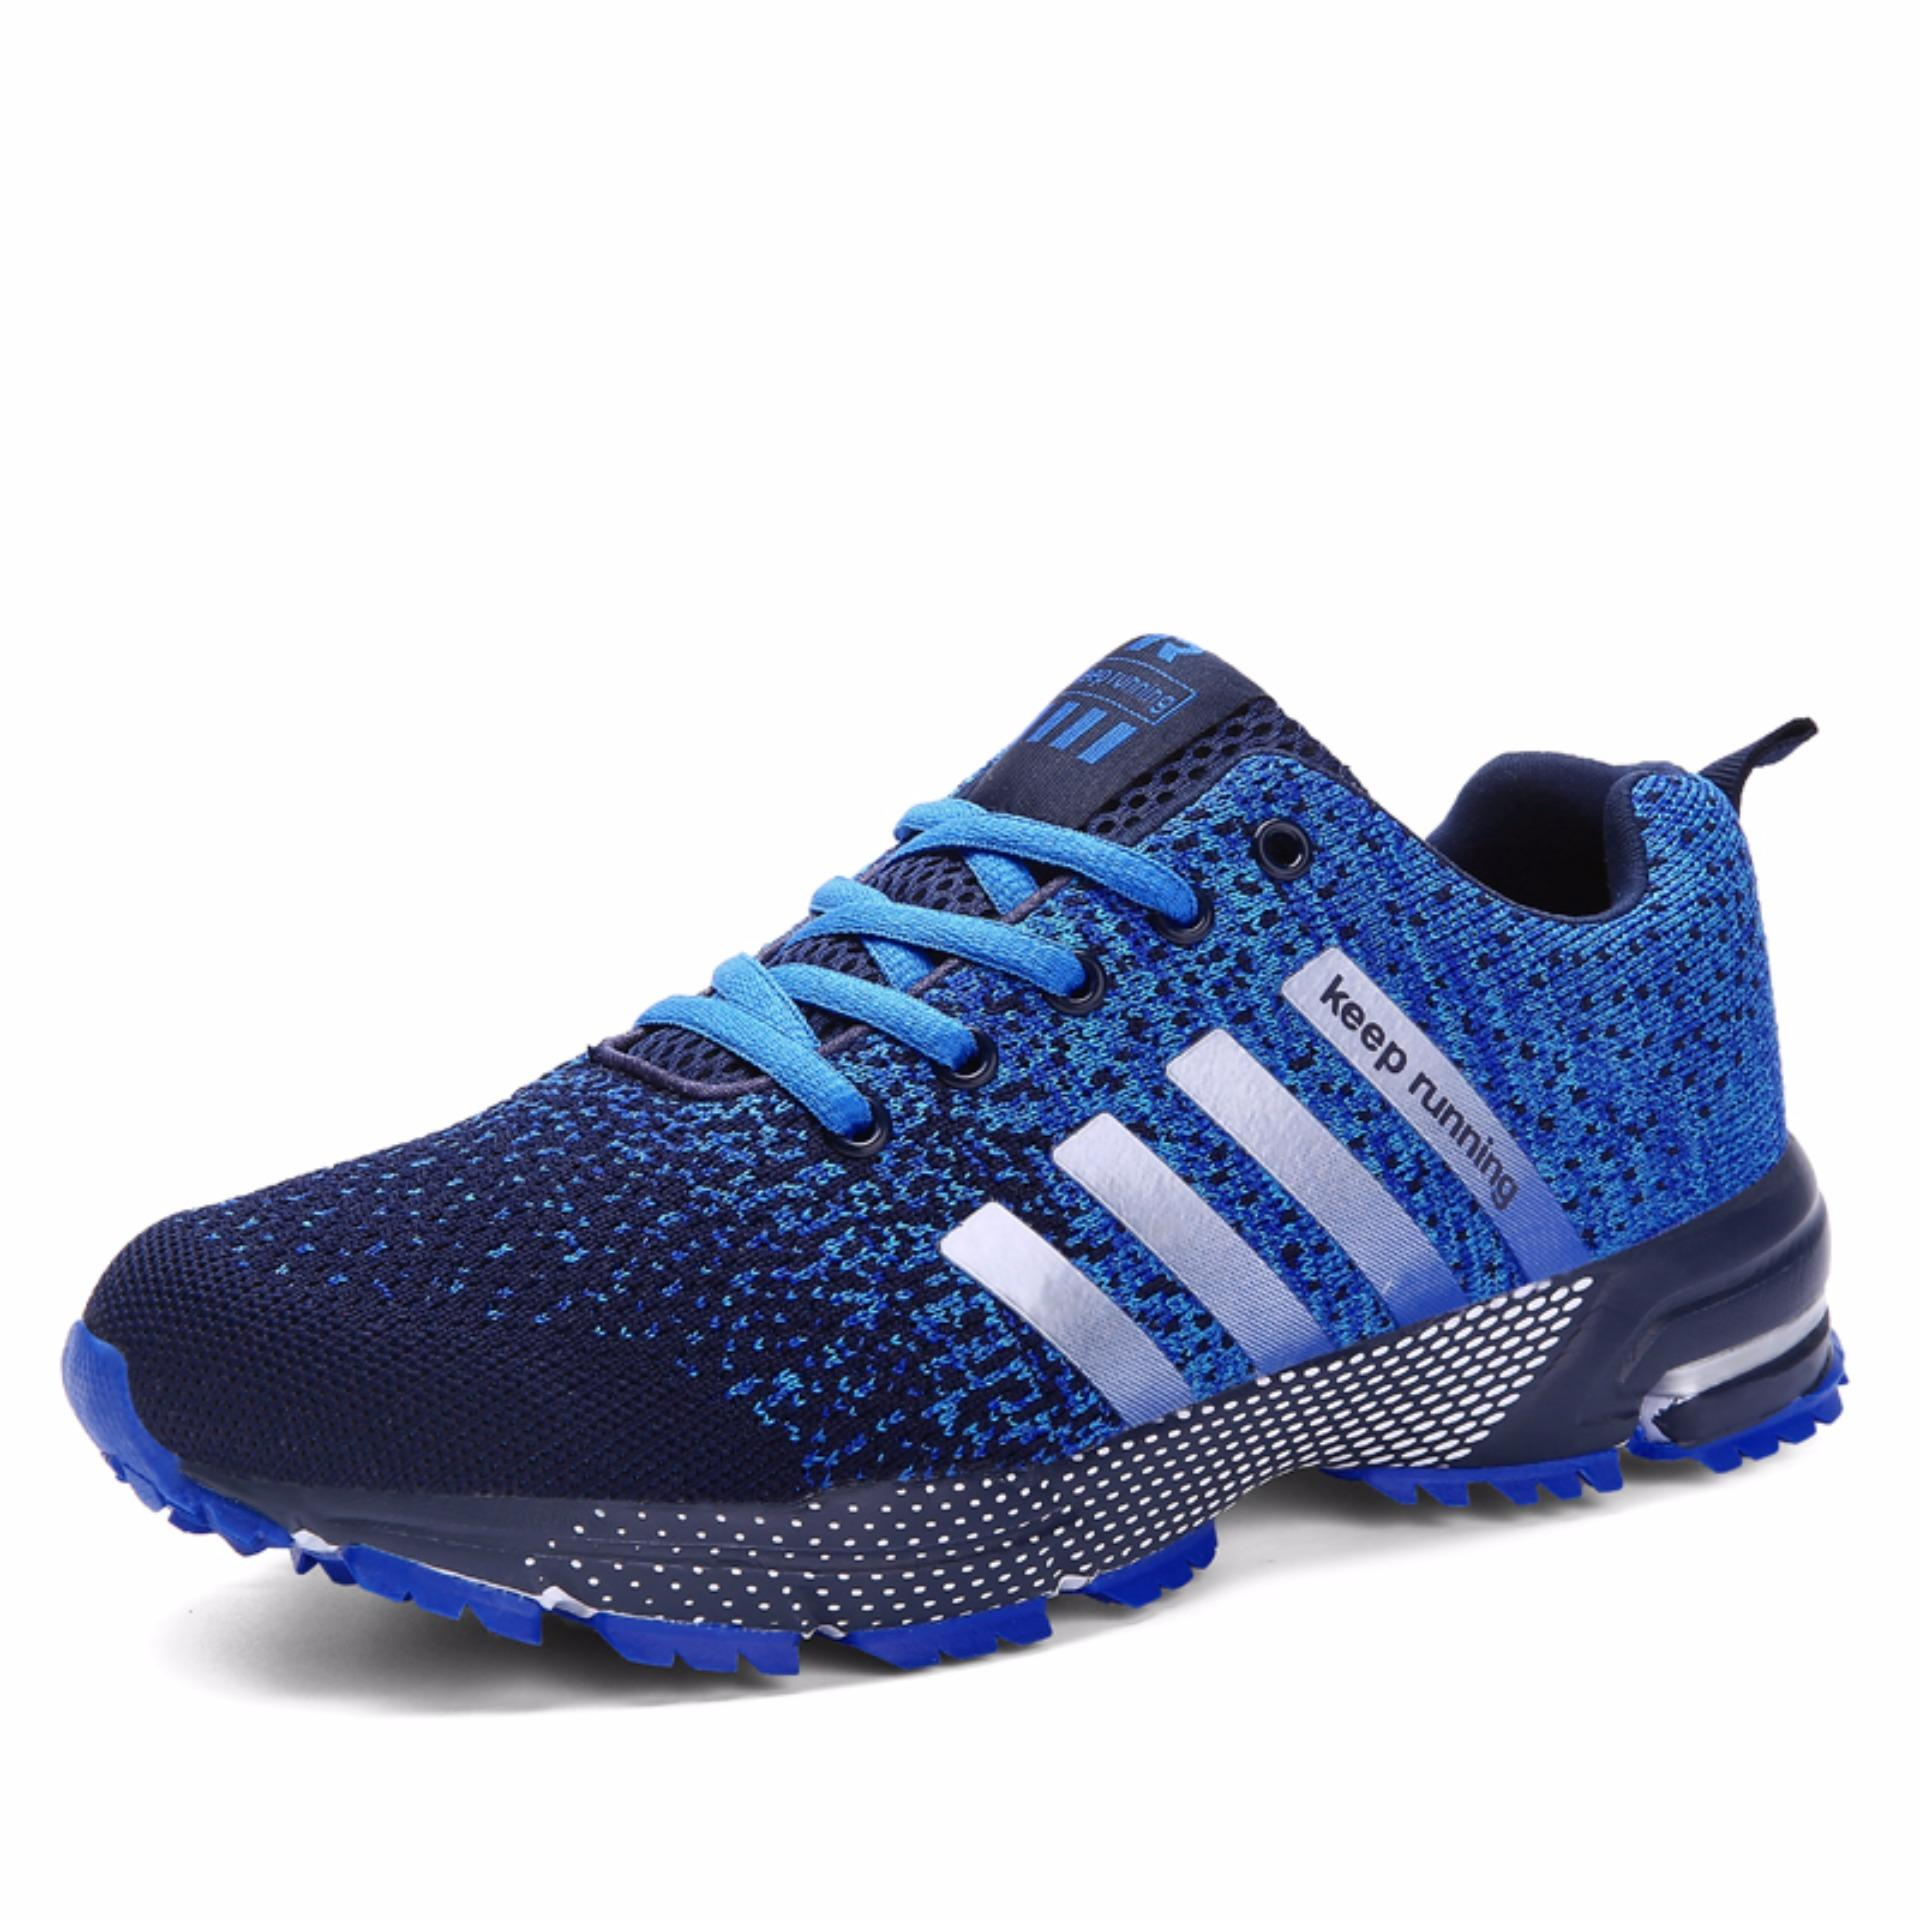 Buy Men Fashion Sneakers Casual Running Sports Shoes Blue Intl Oem Original